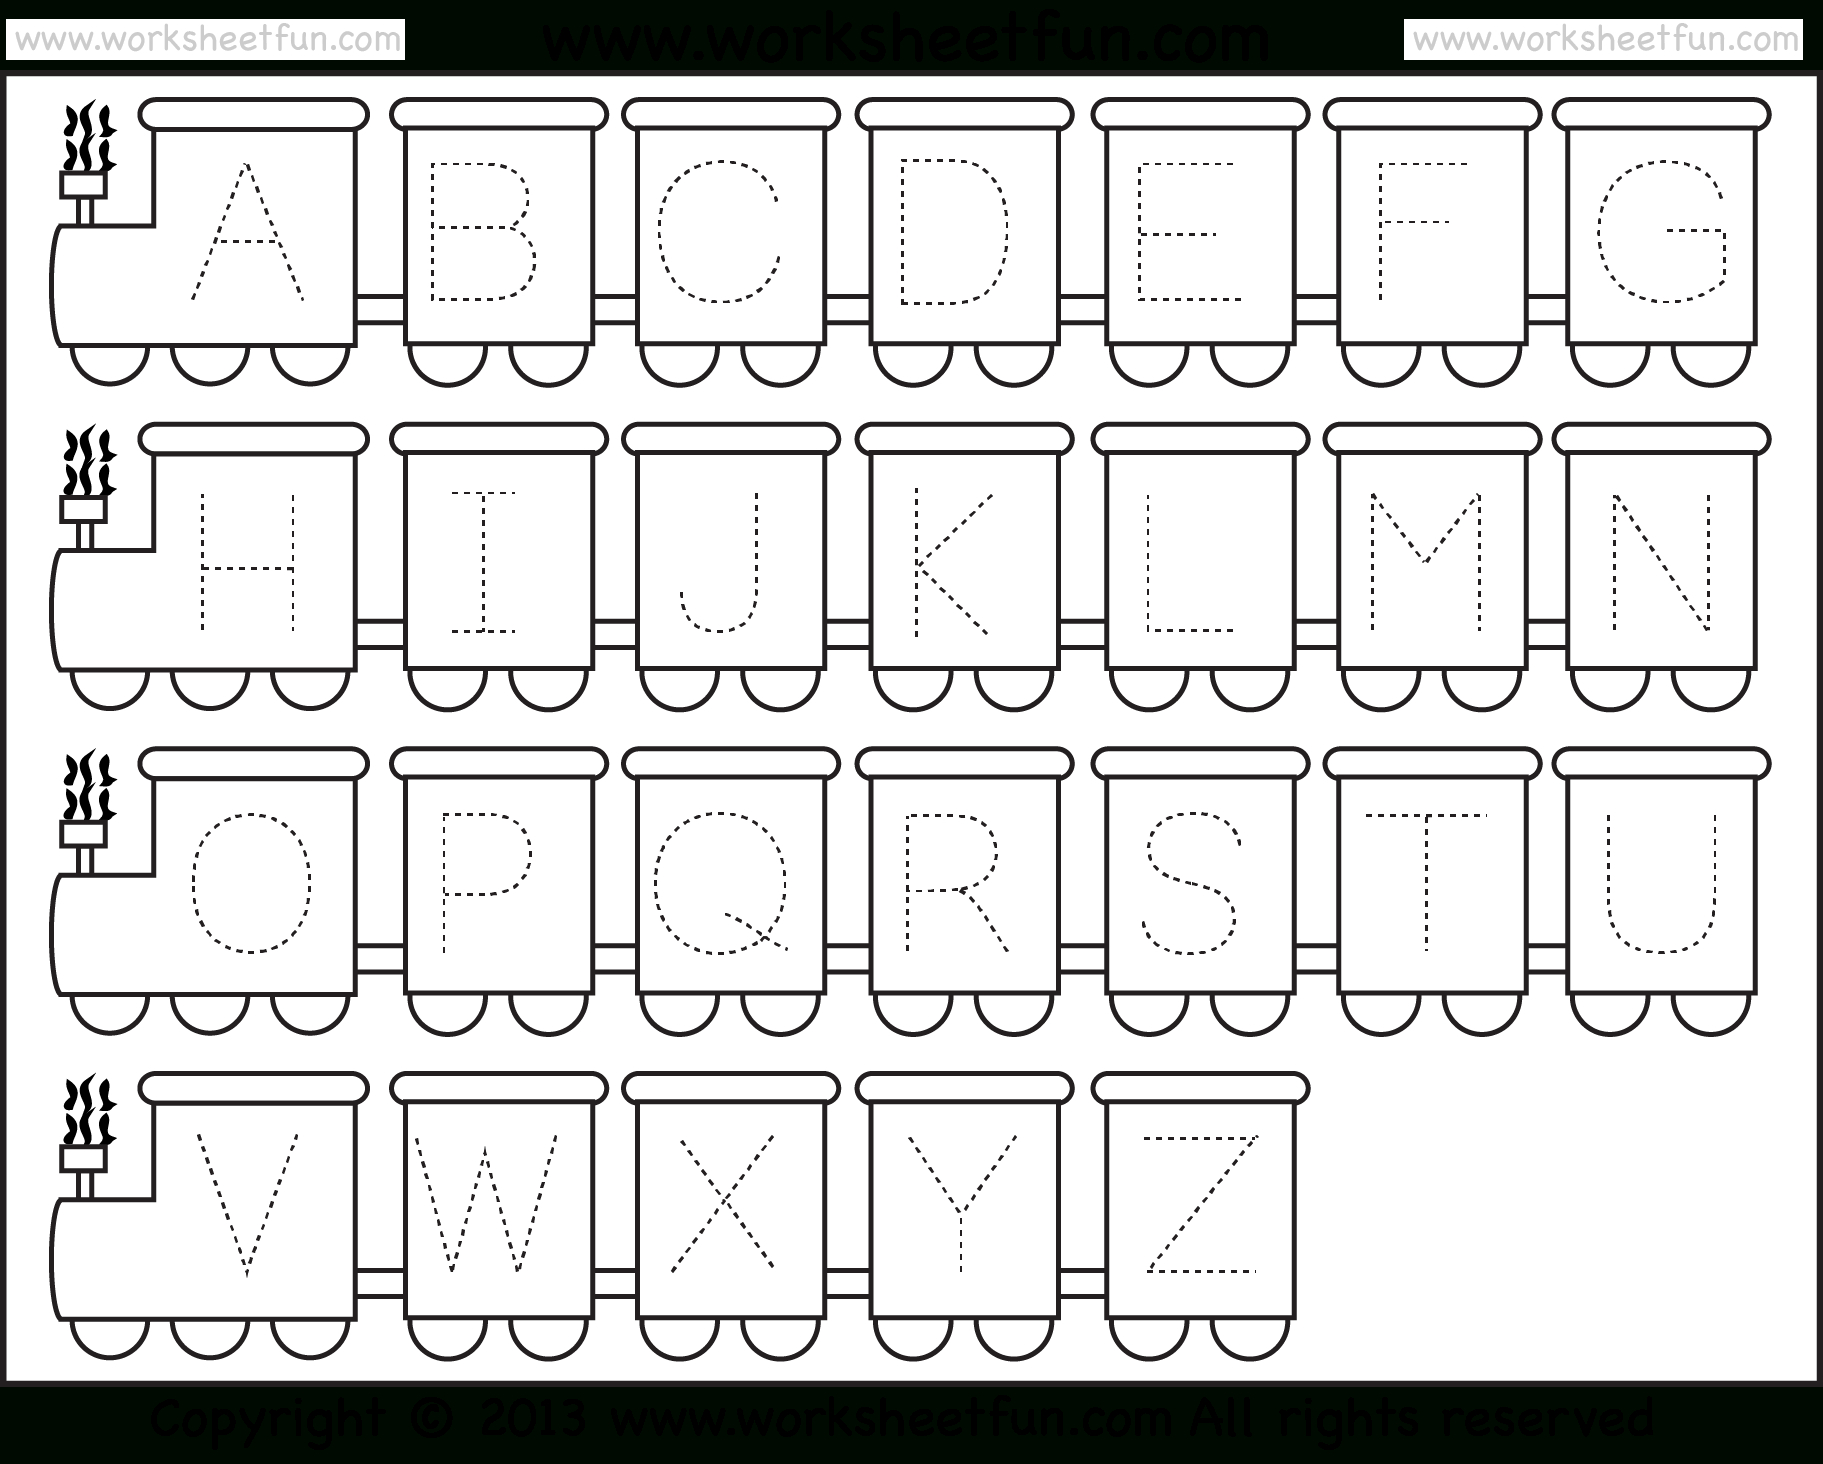 Letter Tracing Worksheet – Train Theme  Free Printable Worksheets With Regard To Free Printable Tracing Alphabet Worksheets